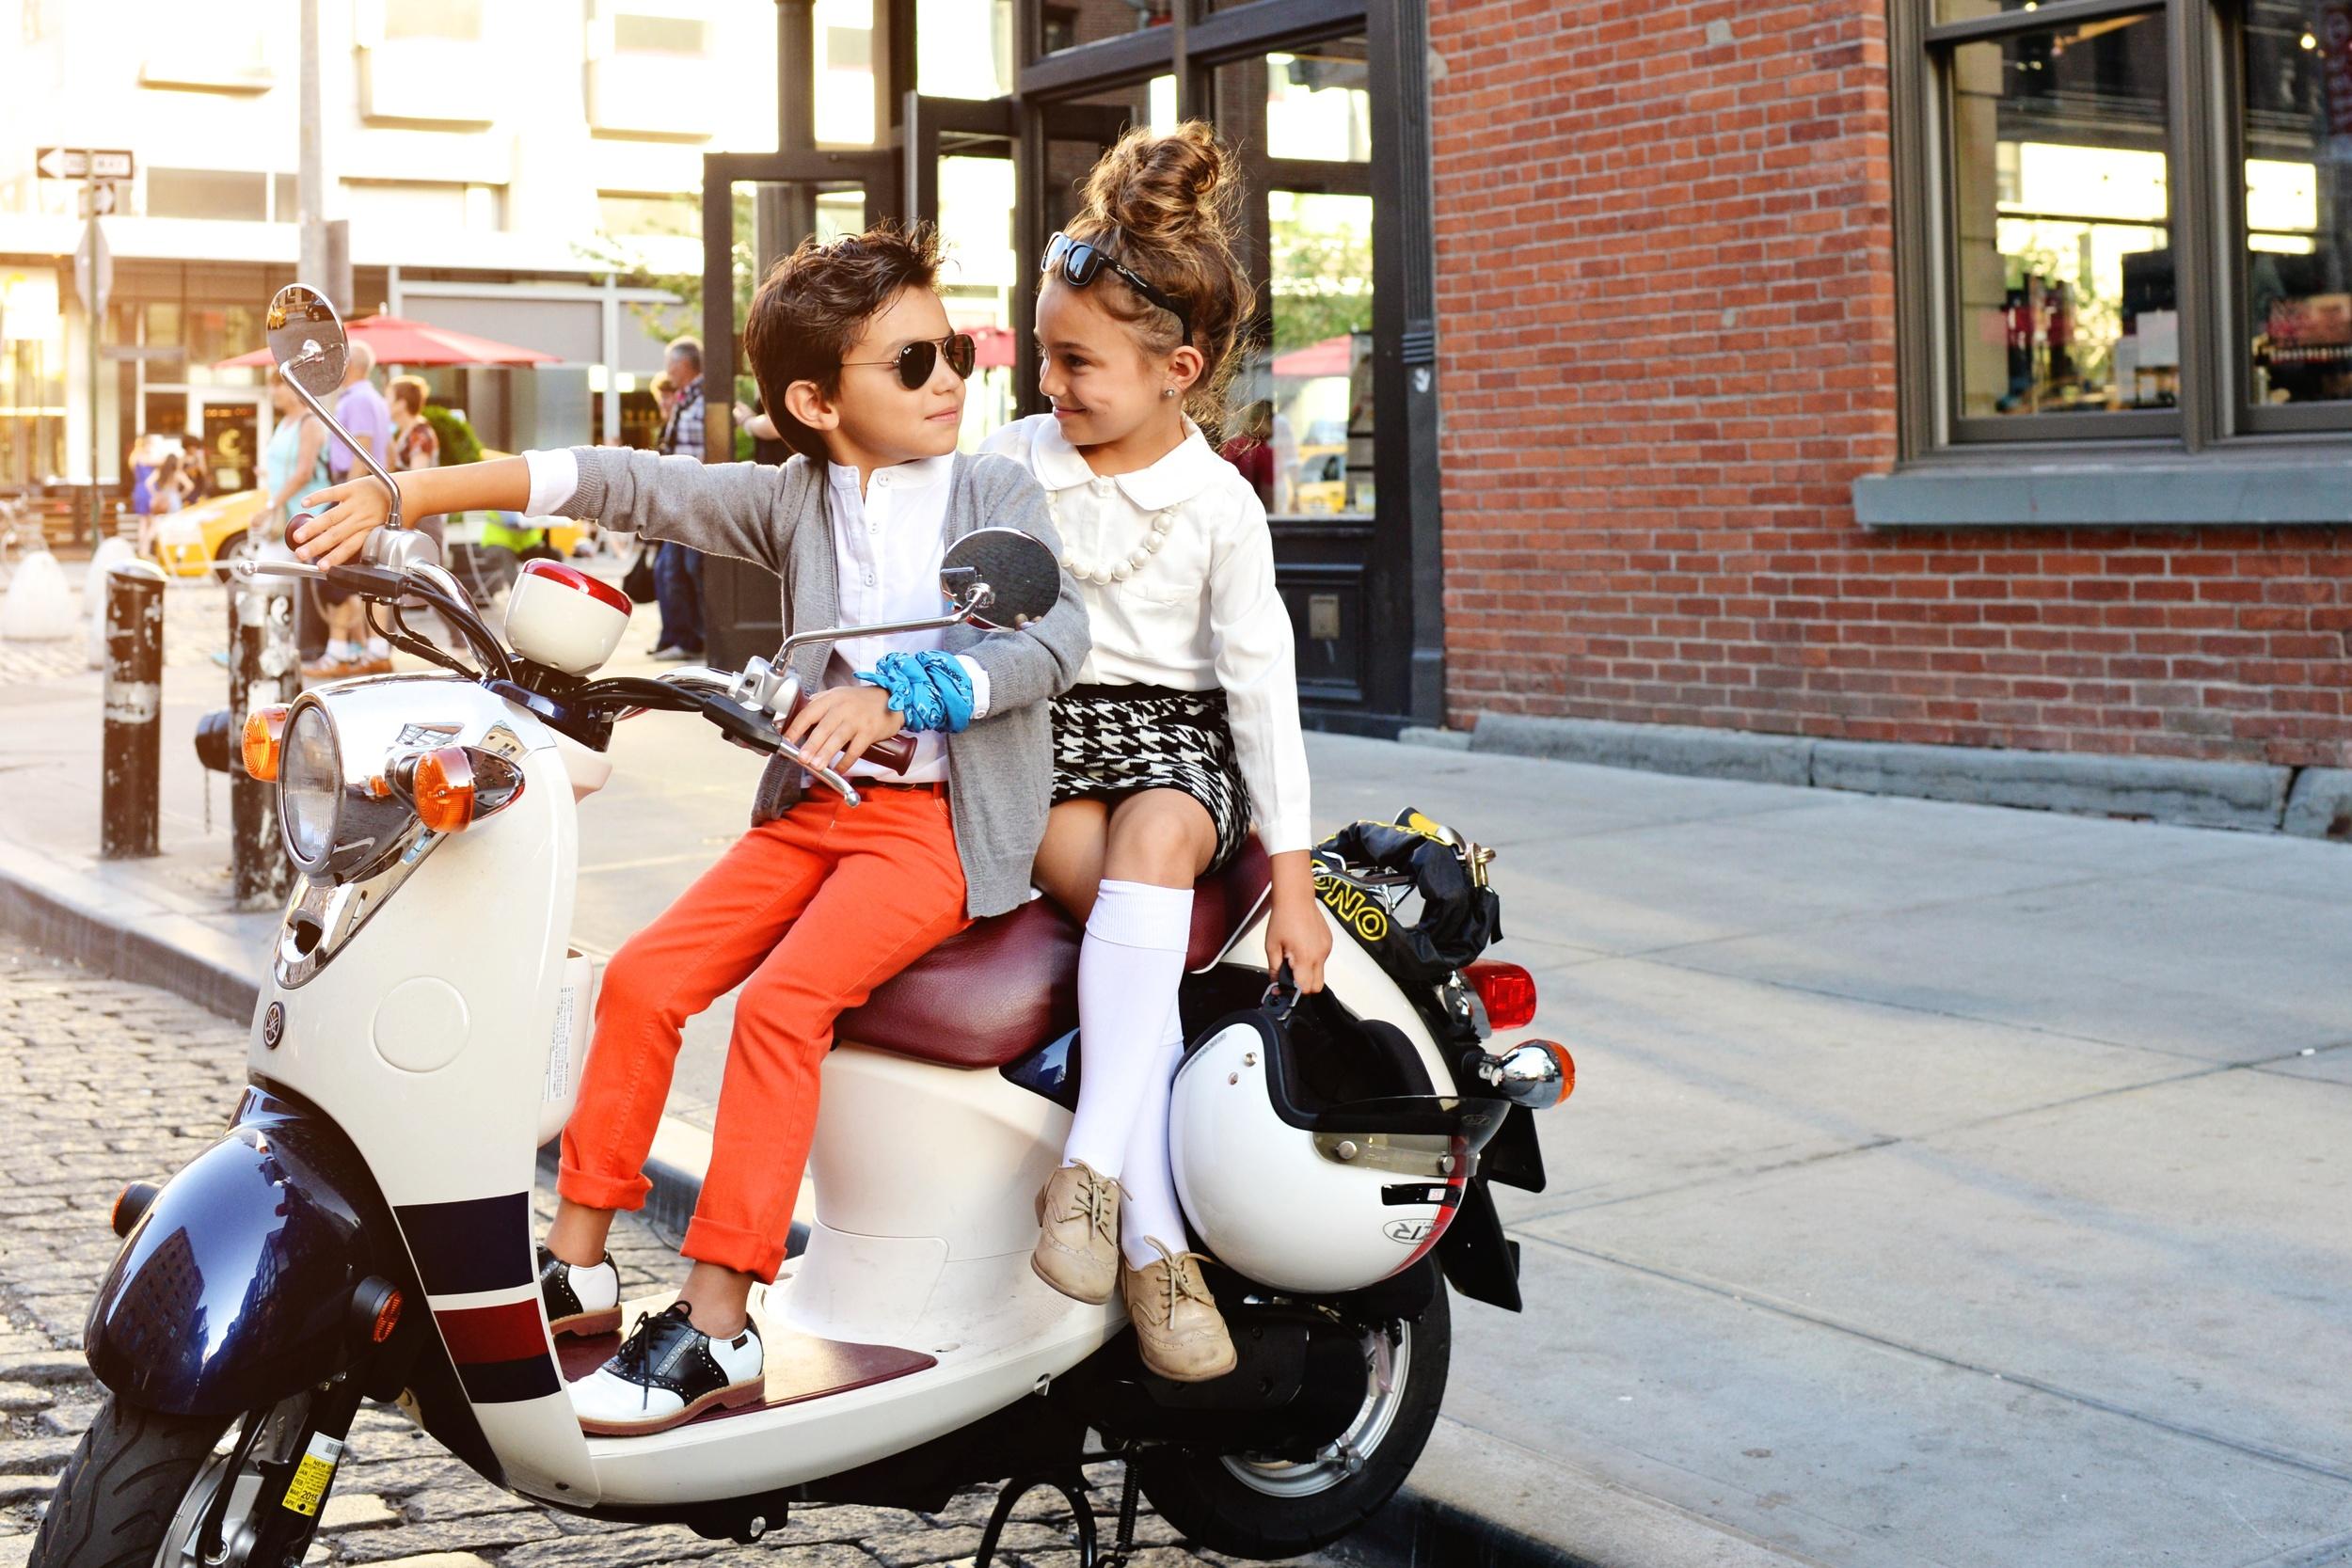 Enfant Street Style by Gina Kim Photography